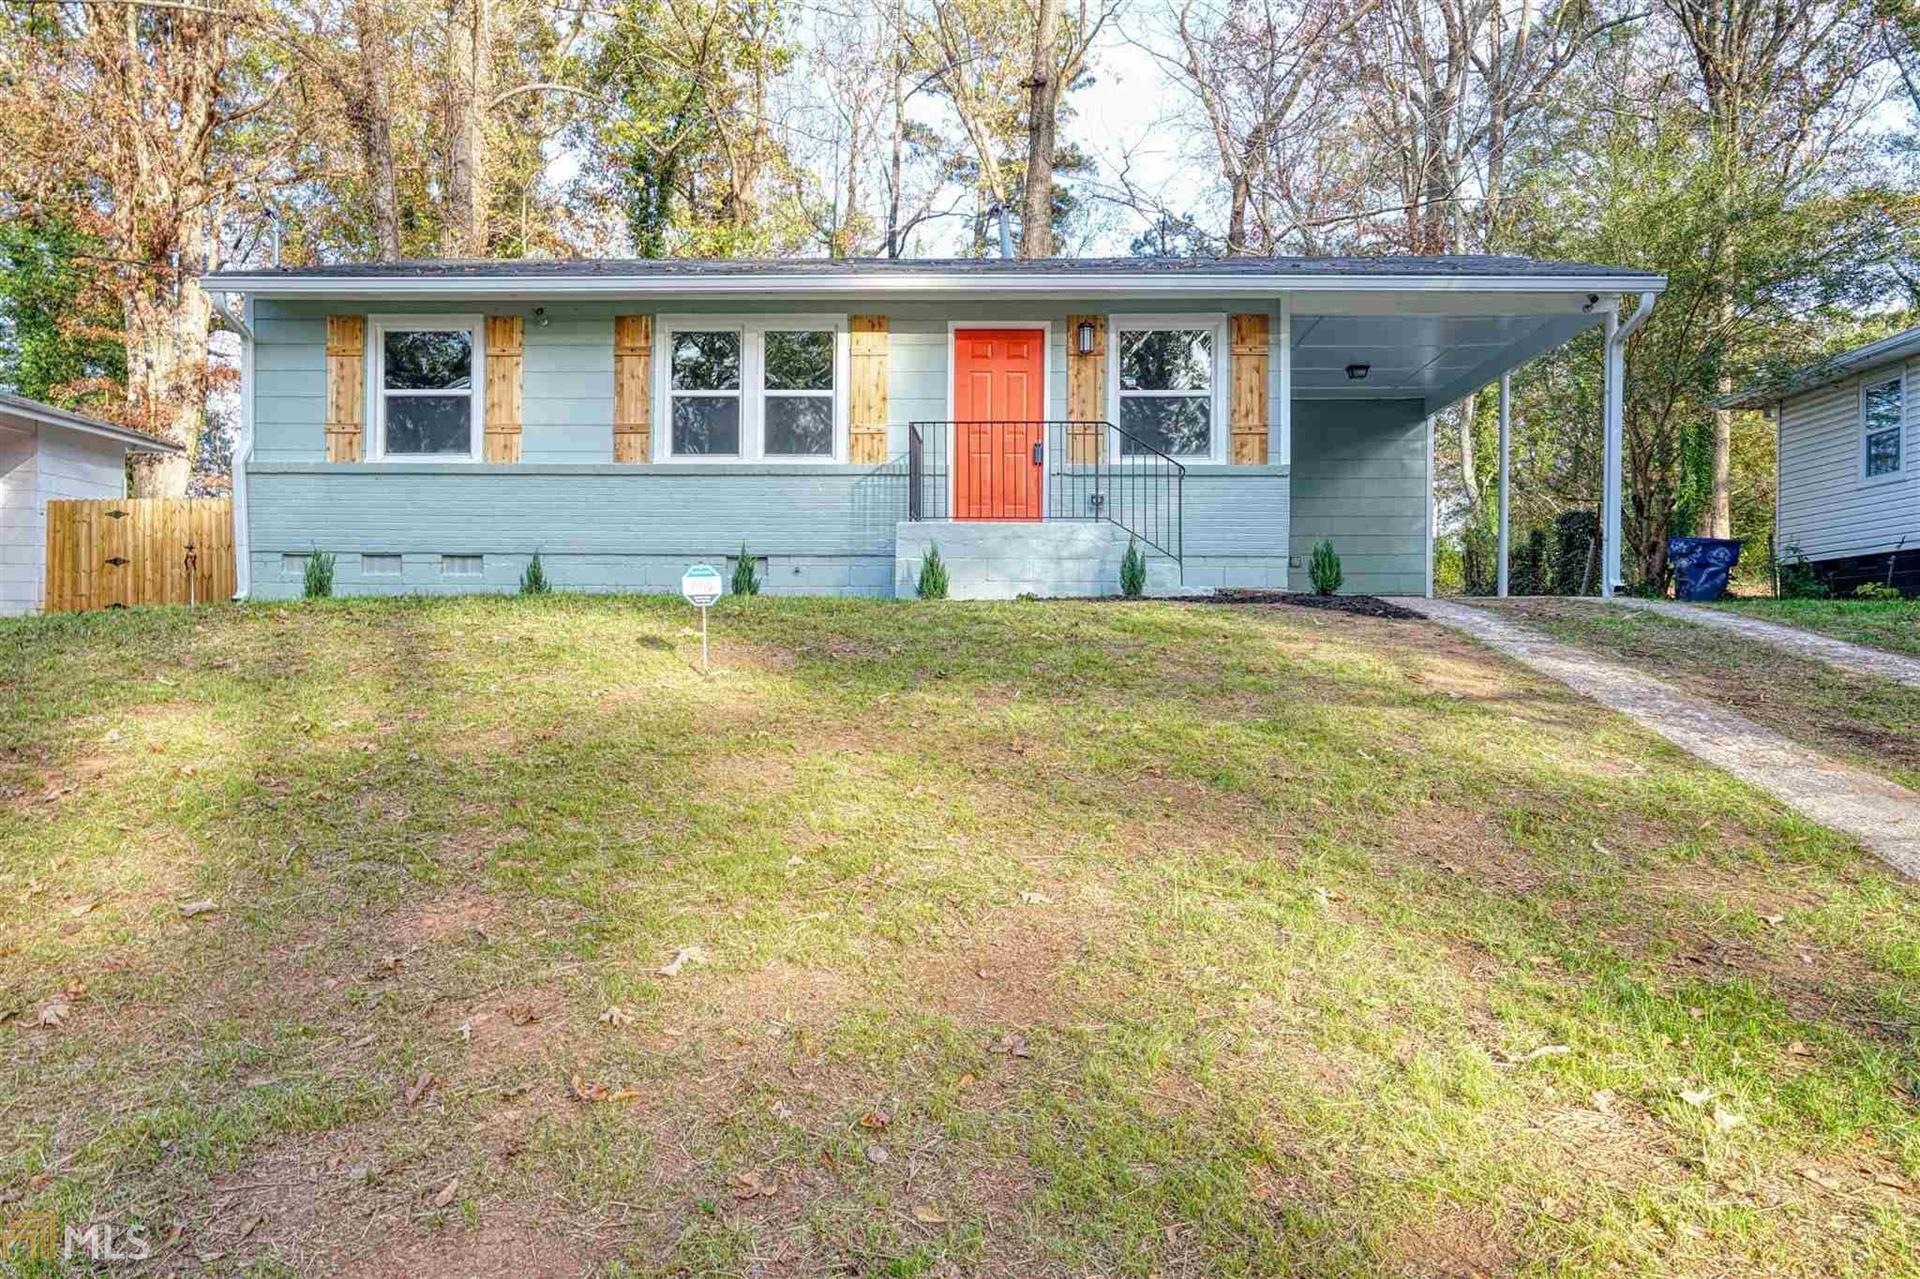 3114 Lone Oak Ave, Atlanta, GA 30354 - MLS#: 8892758